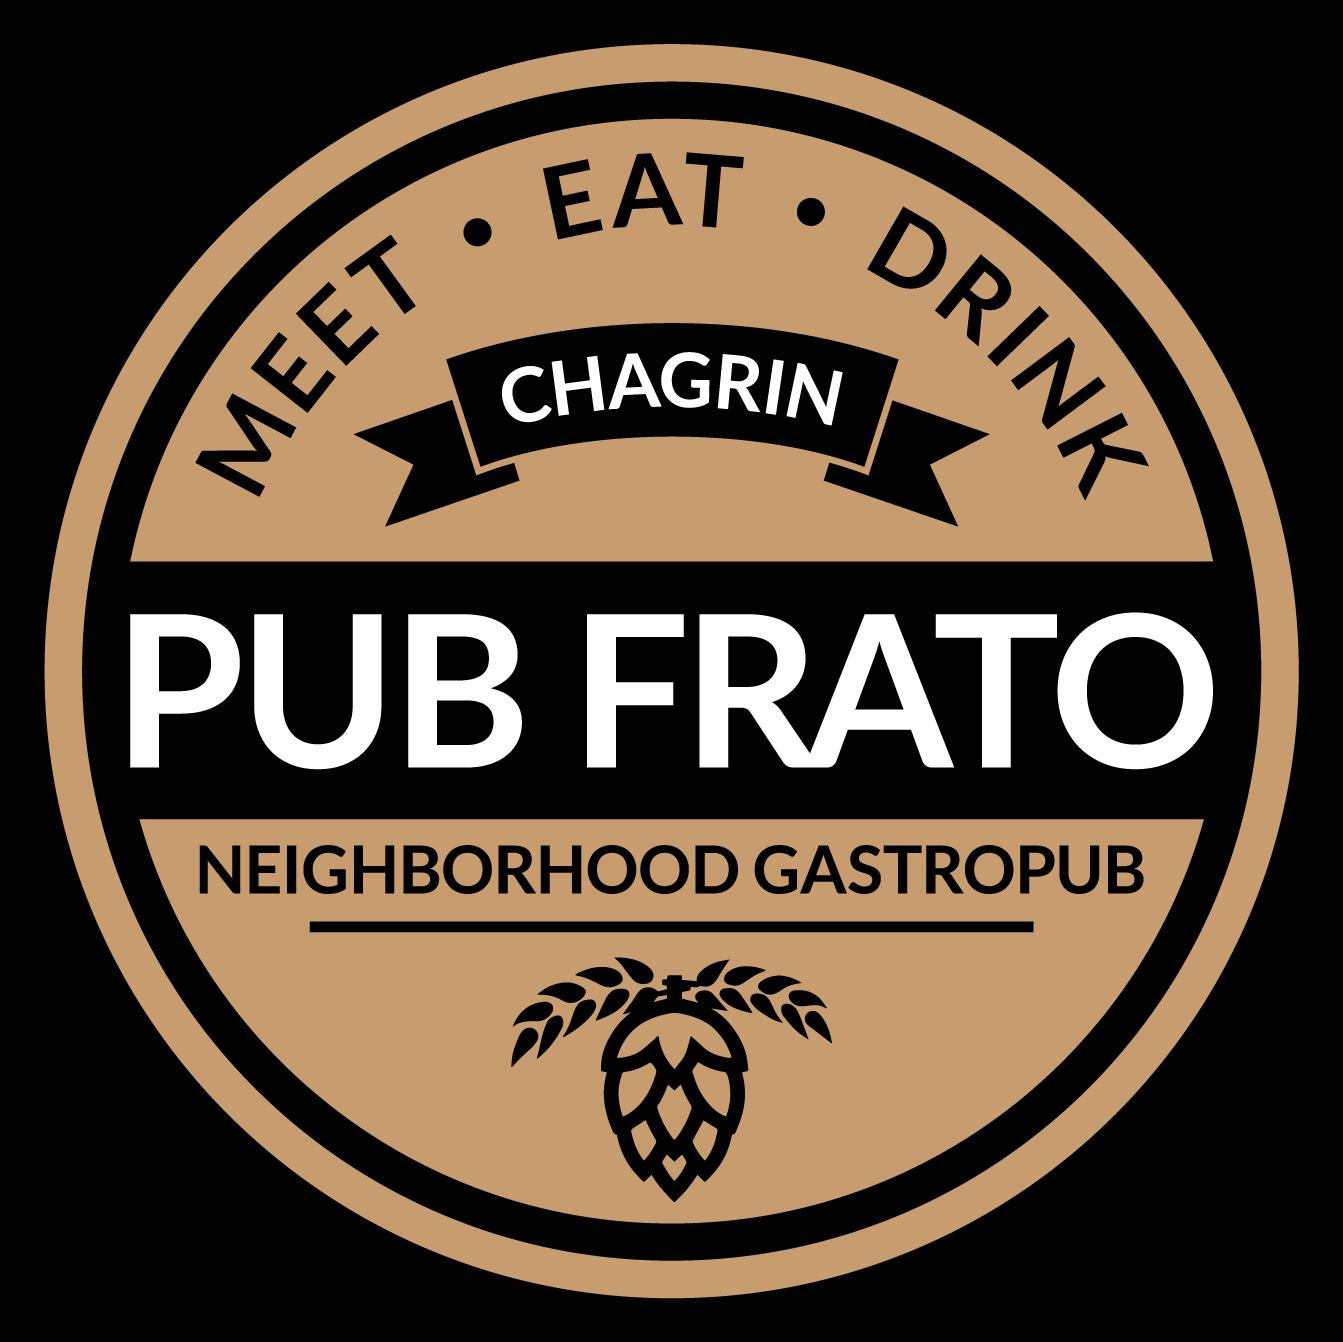 Pub Frato Chagrin